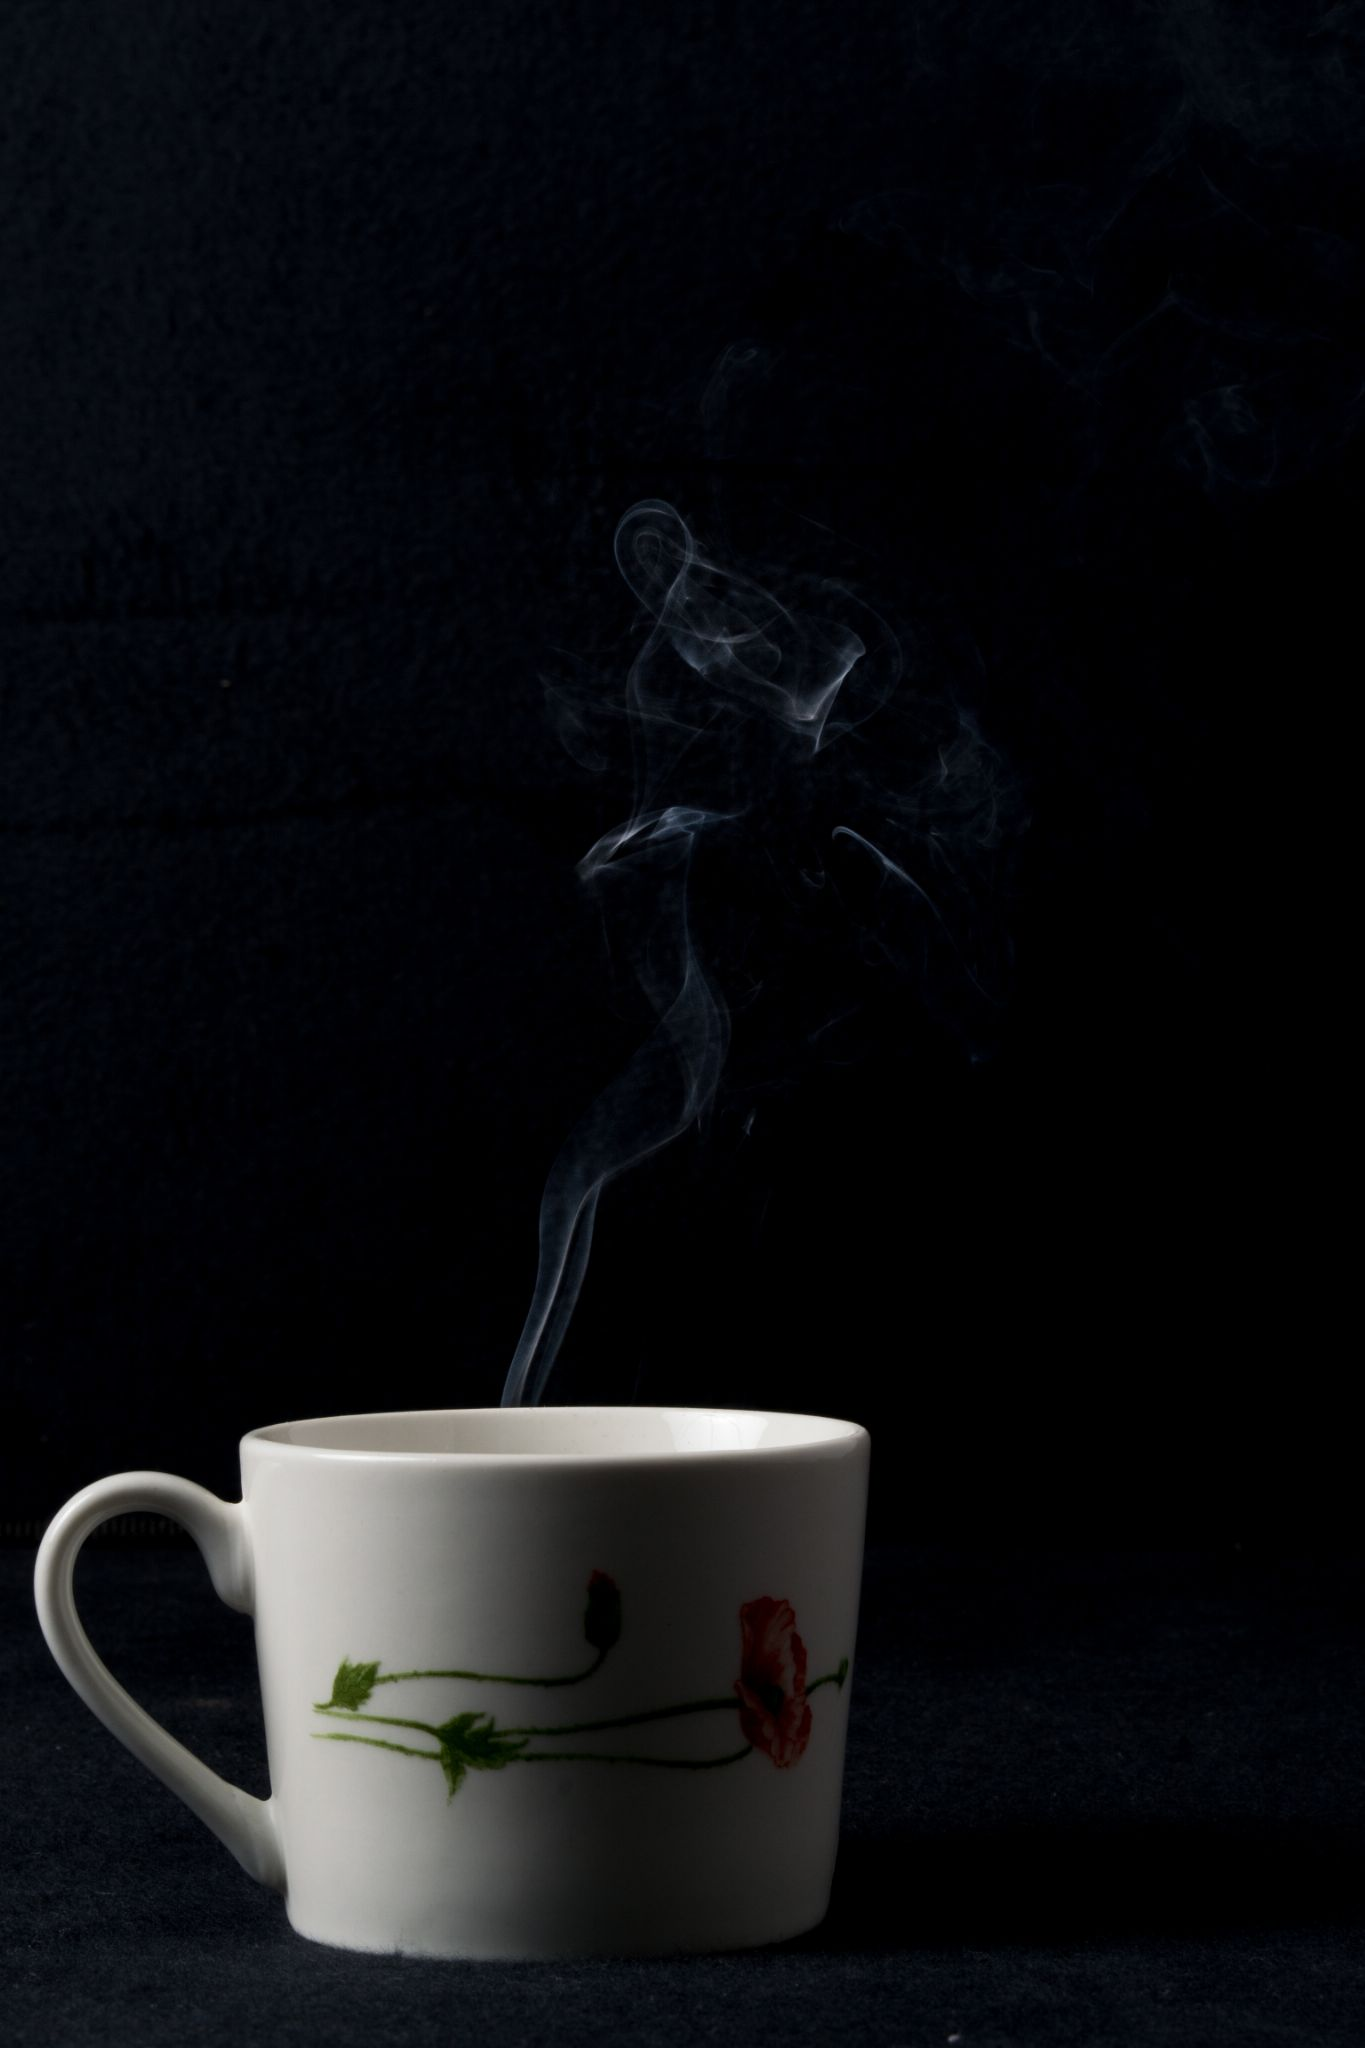 Take a coffee by Christian Cardoso